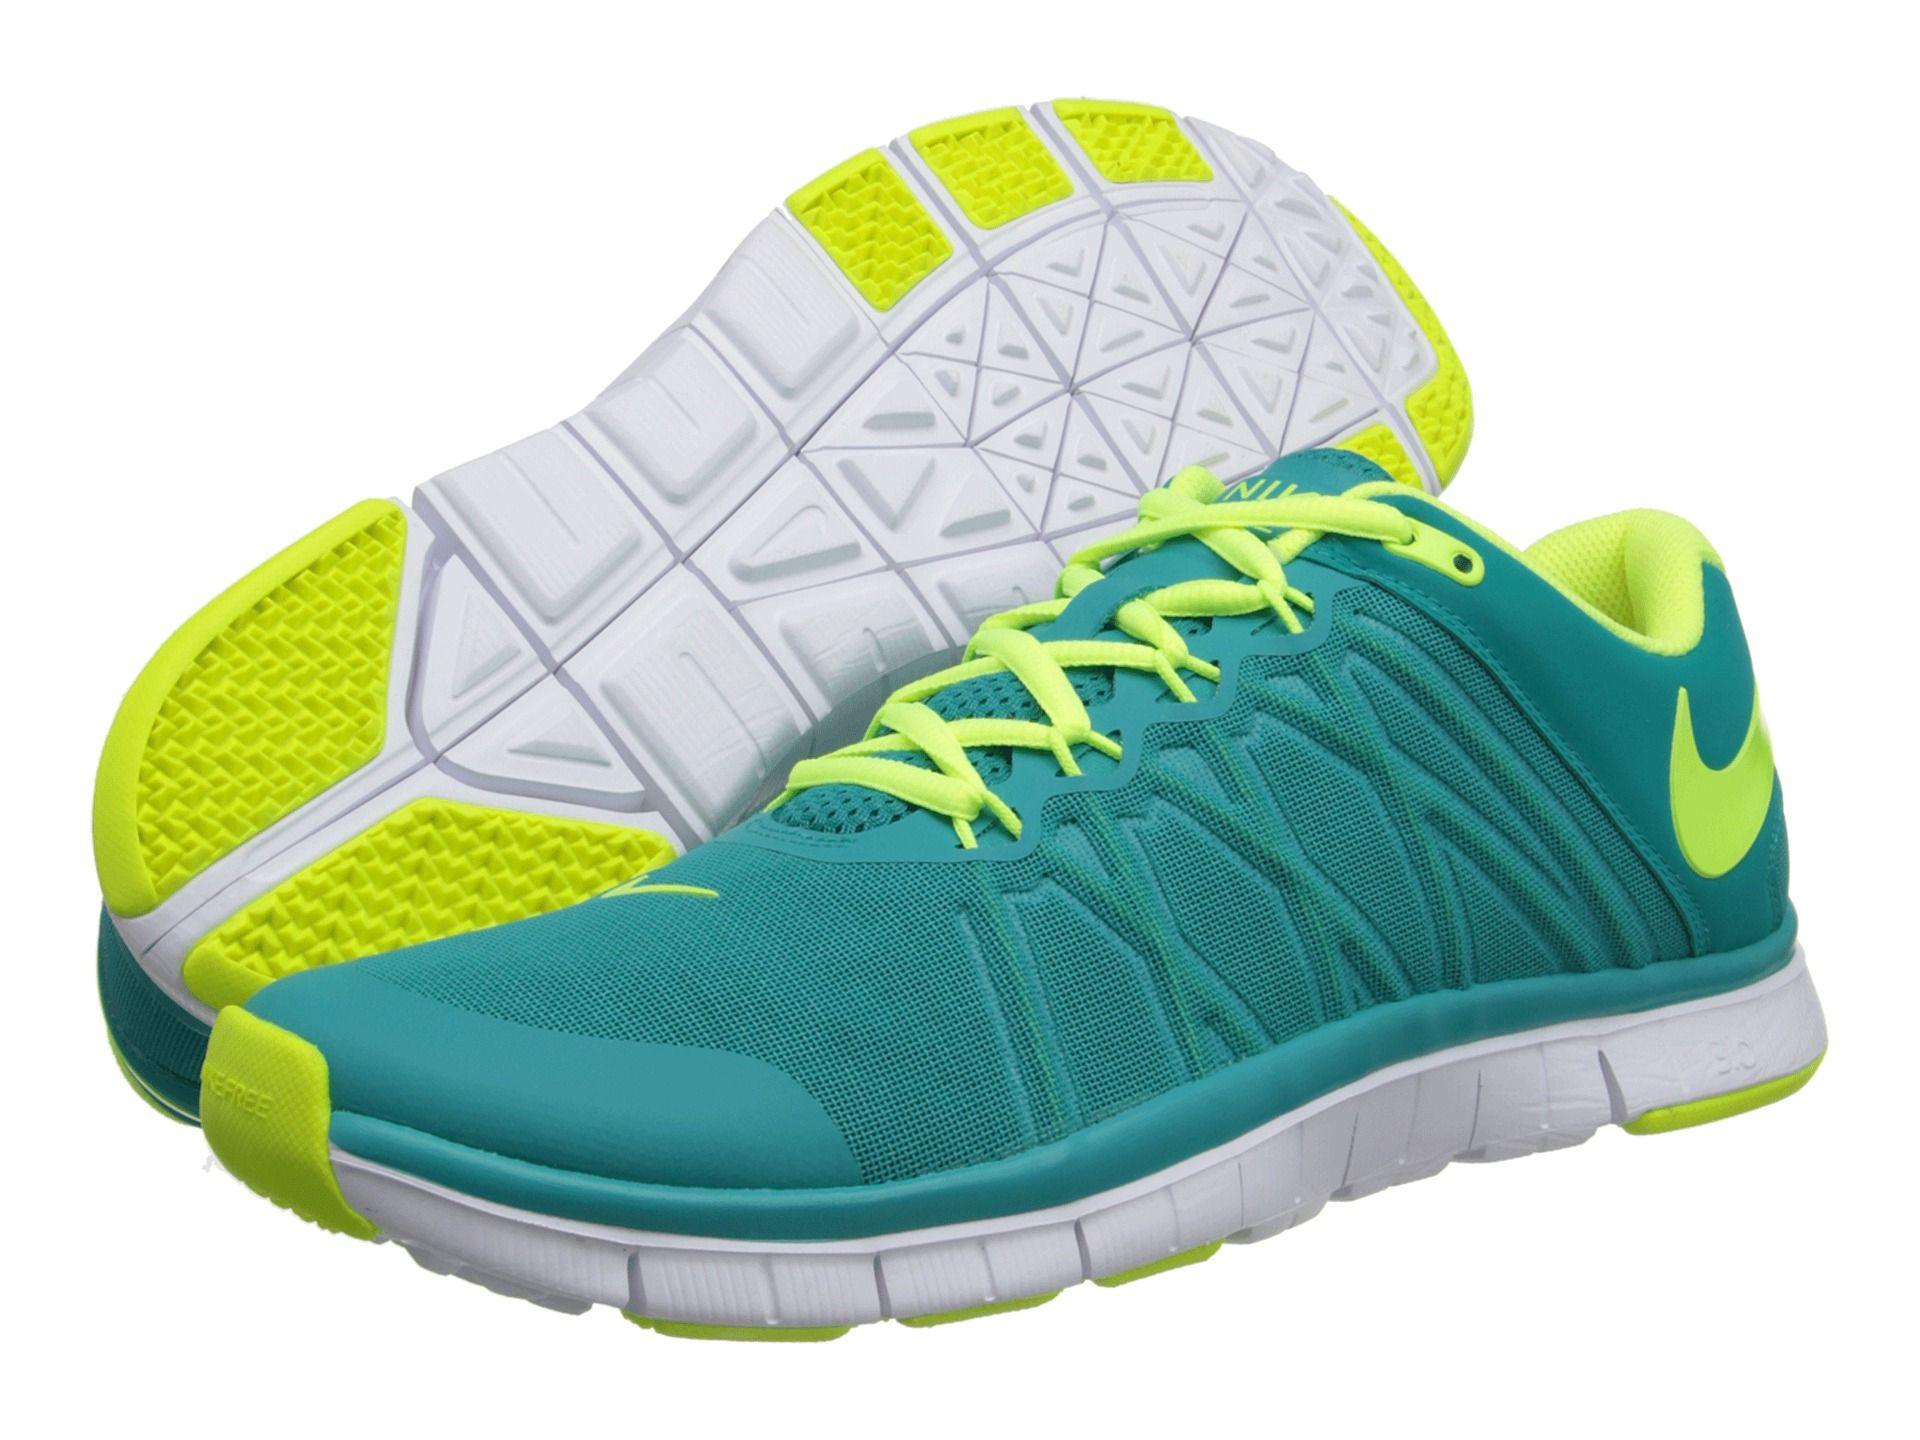 Mens Shoes Nike Free Trainer 3.0 Turbo Green/White/Volt